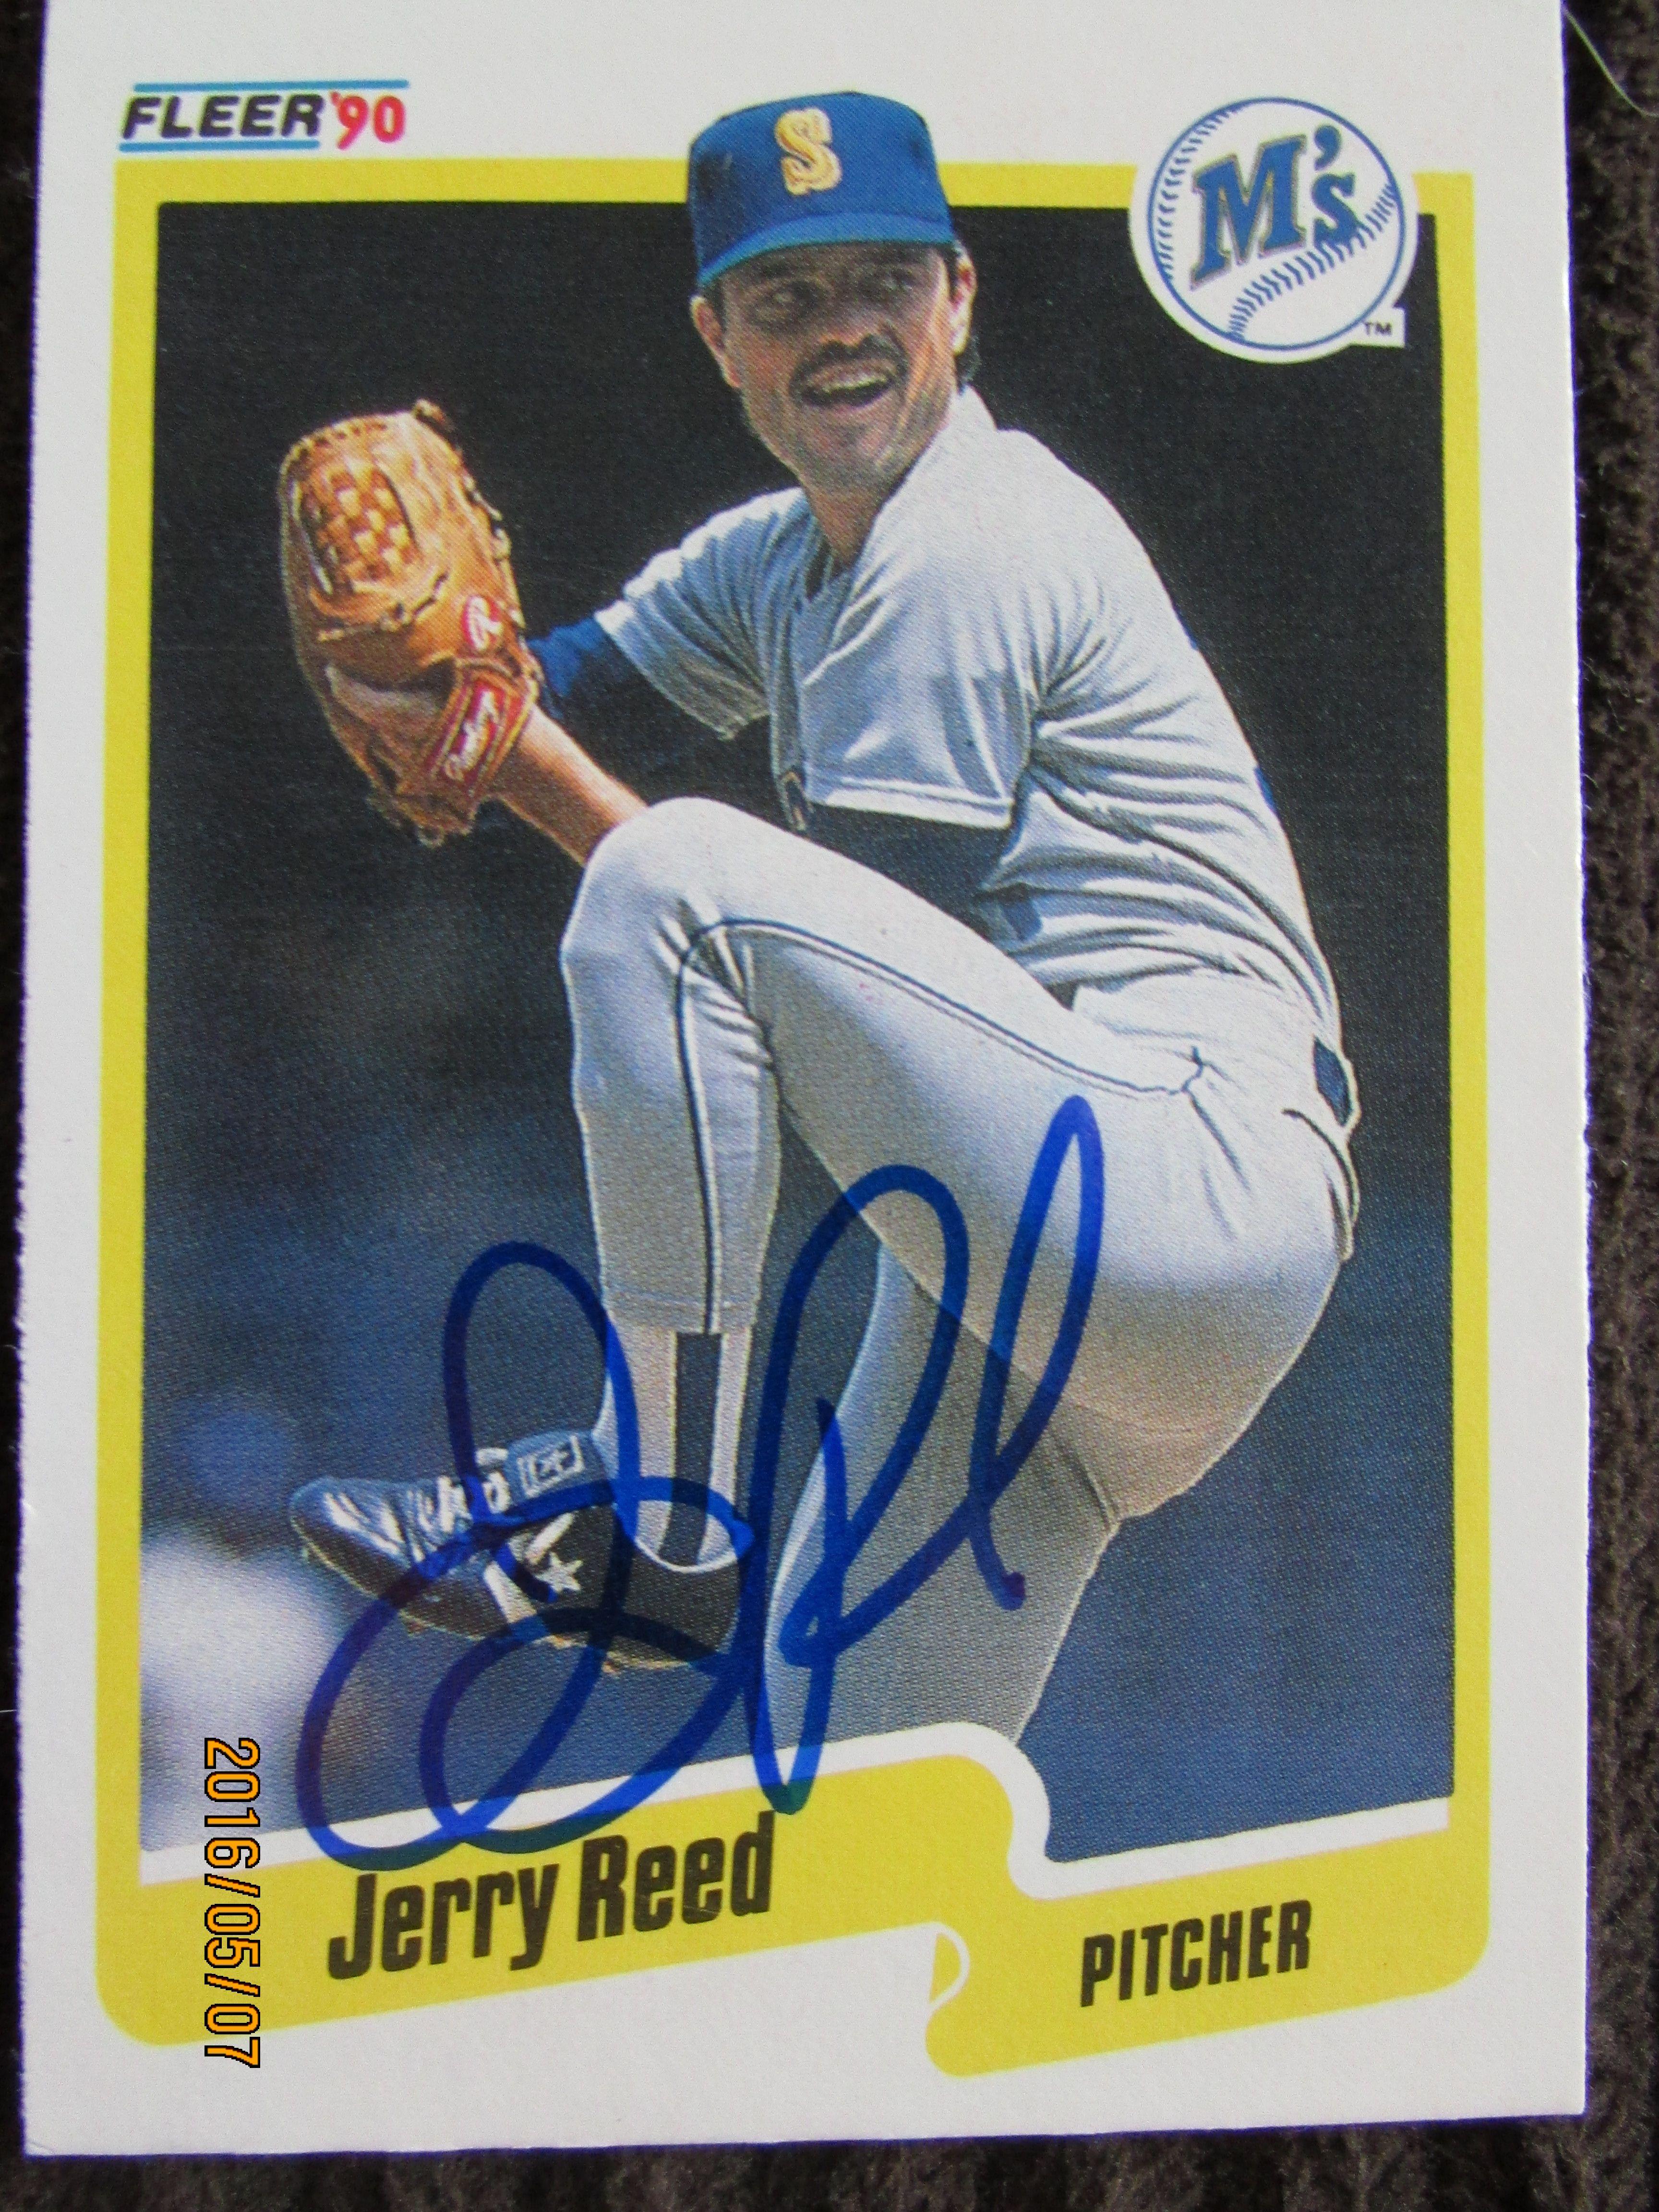 1990 fleer baseball cards sports cards